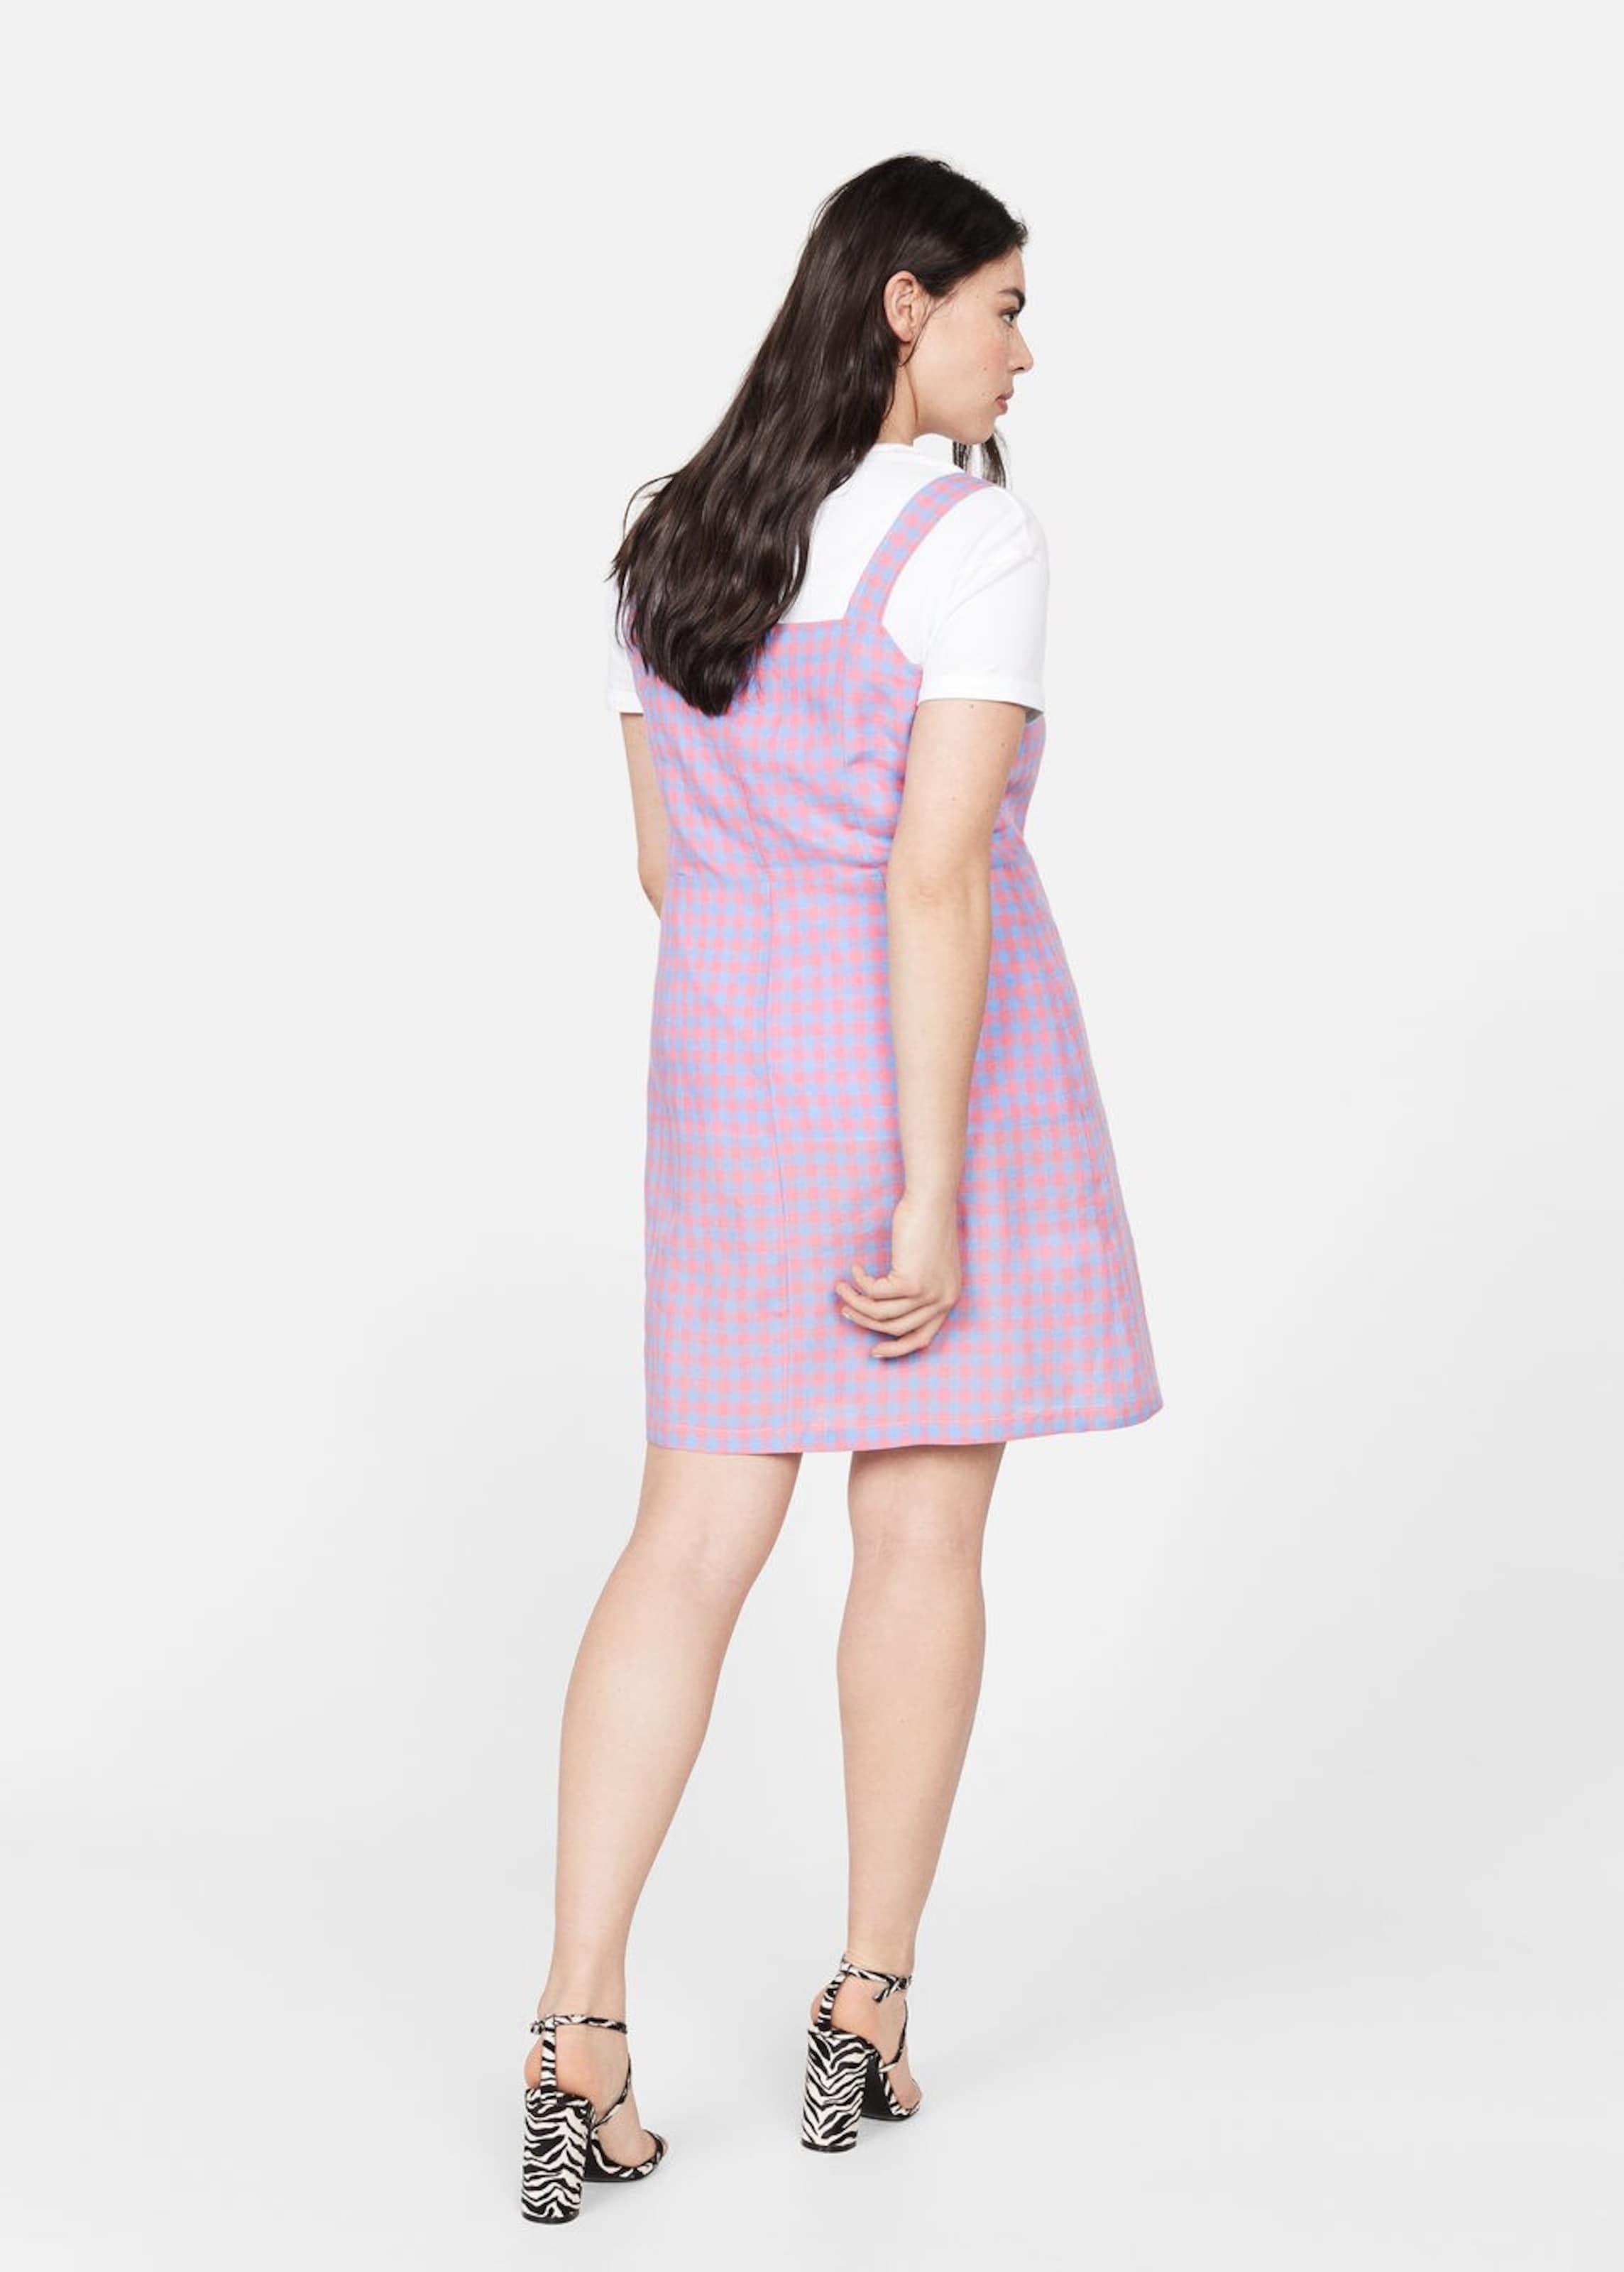 HellblauRosa Mango Violeta By Kleid In SzVqLUpGM